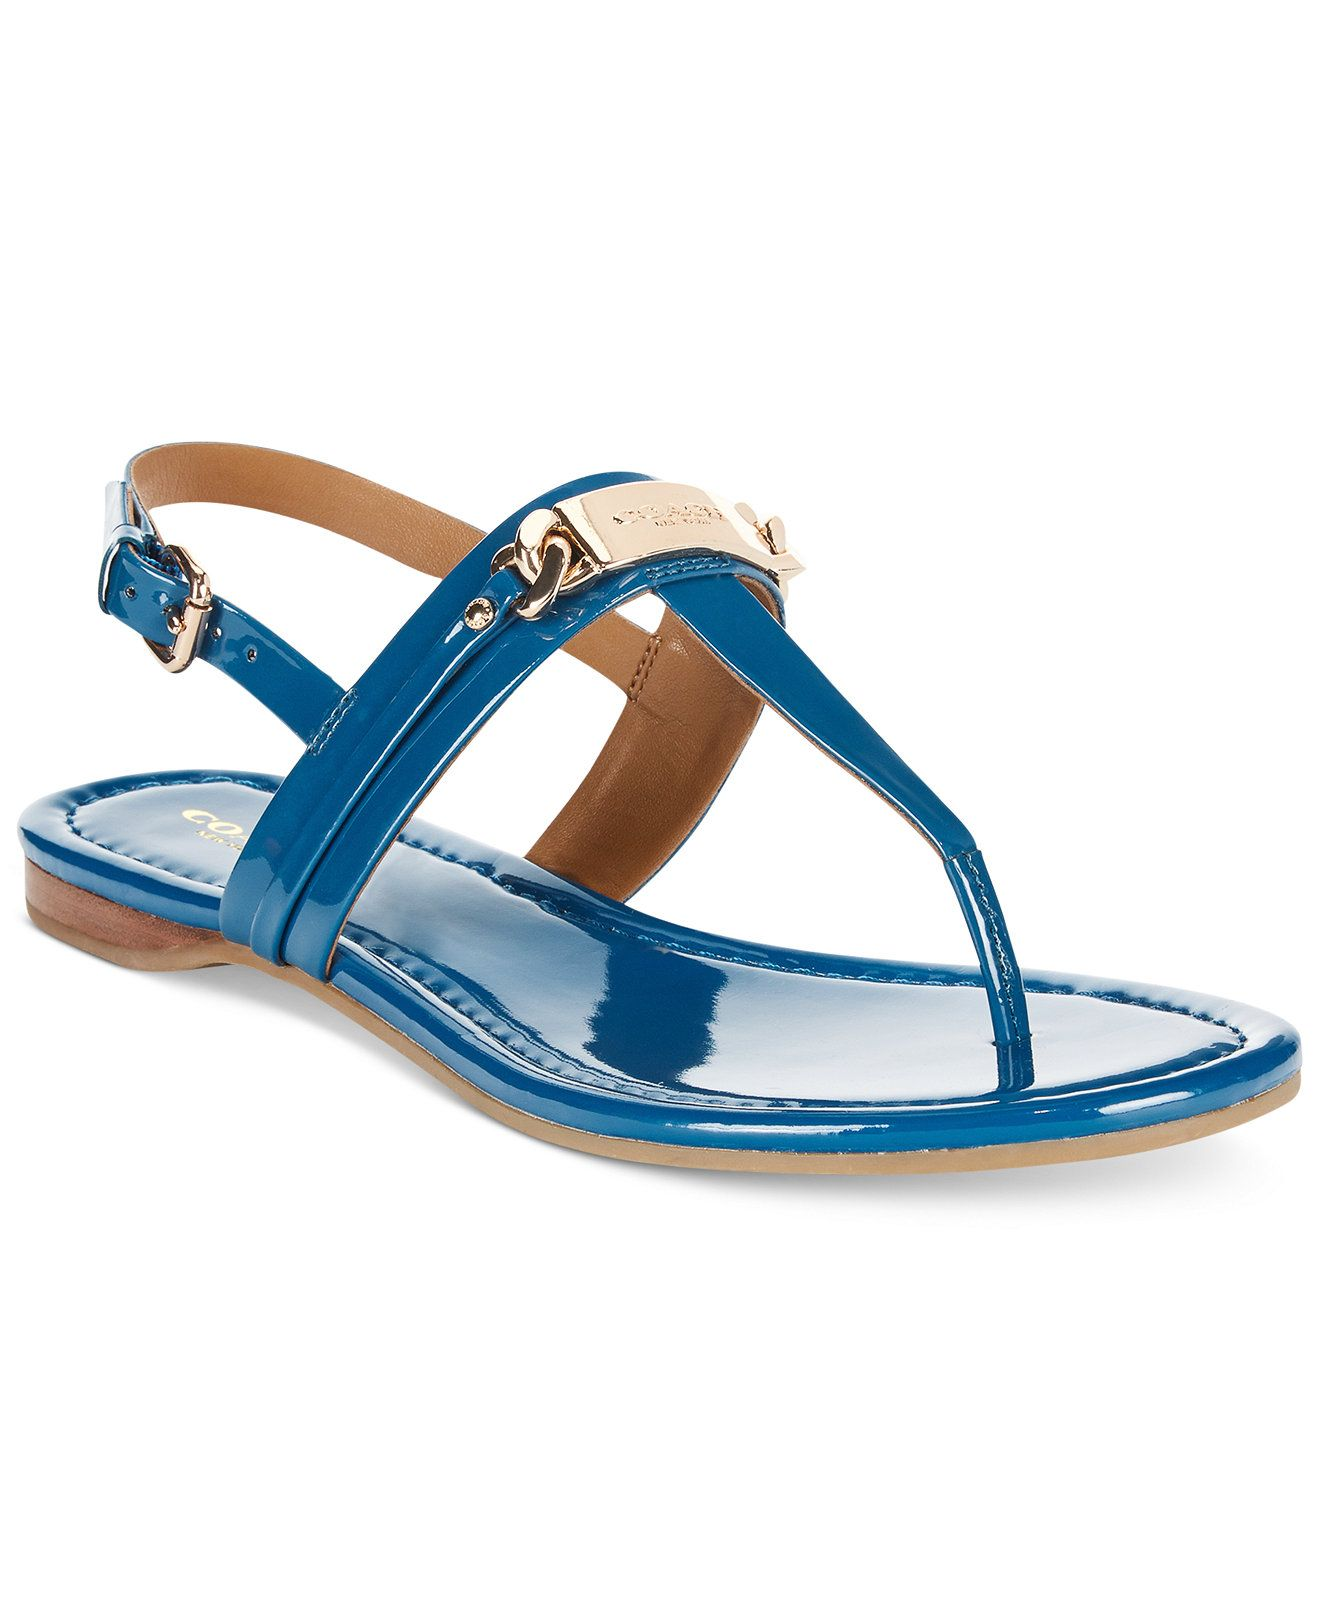 Shoes n sandals online - Coach Caterine Logo Hardware Flat Sandals Coach Shoes Handbags Accessories Macy S